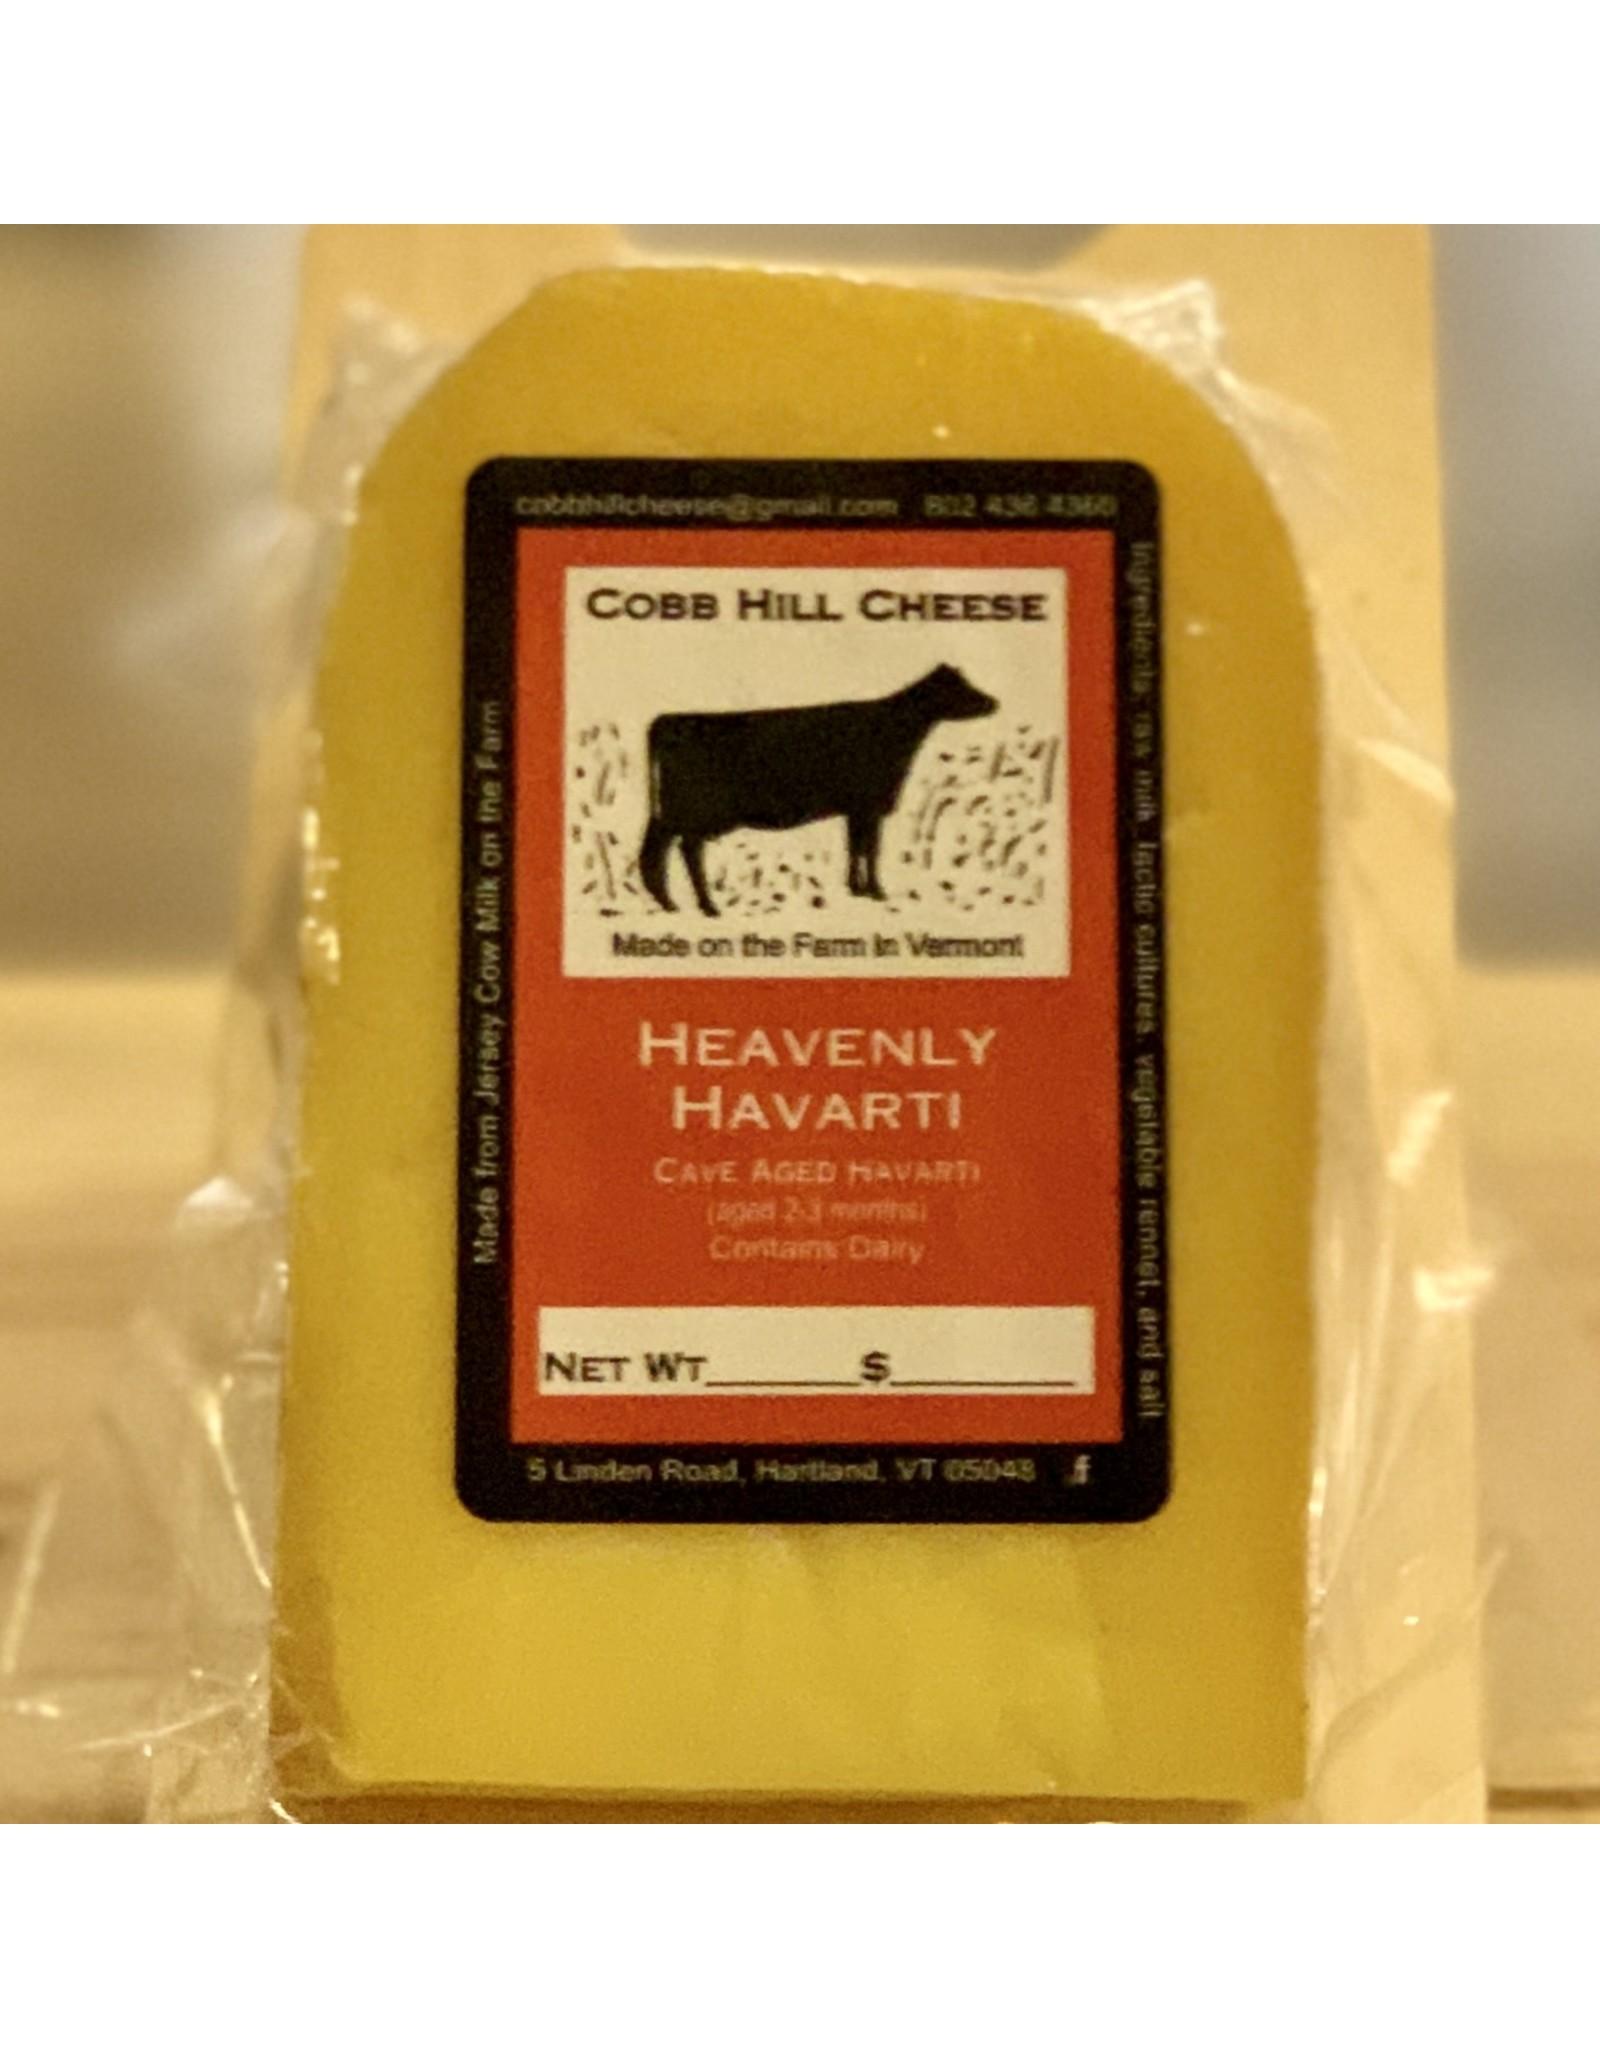 "Cheese Cobb Hill Cheese ""Heavenly Havarti"" Cave Aged Havarti - Hartland, Vermont"